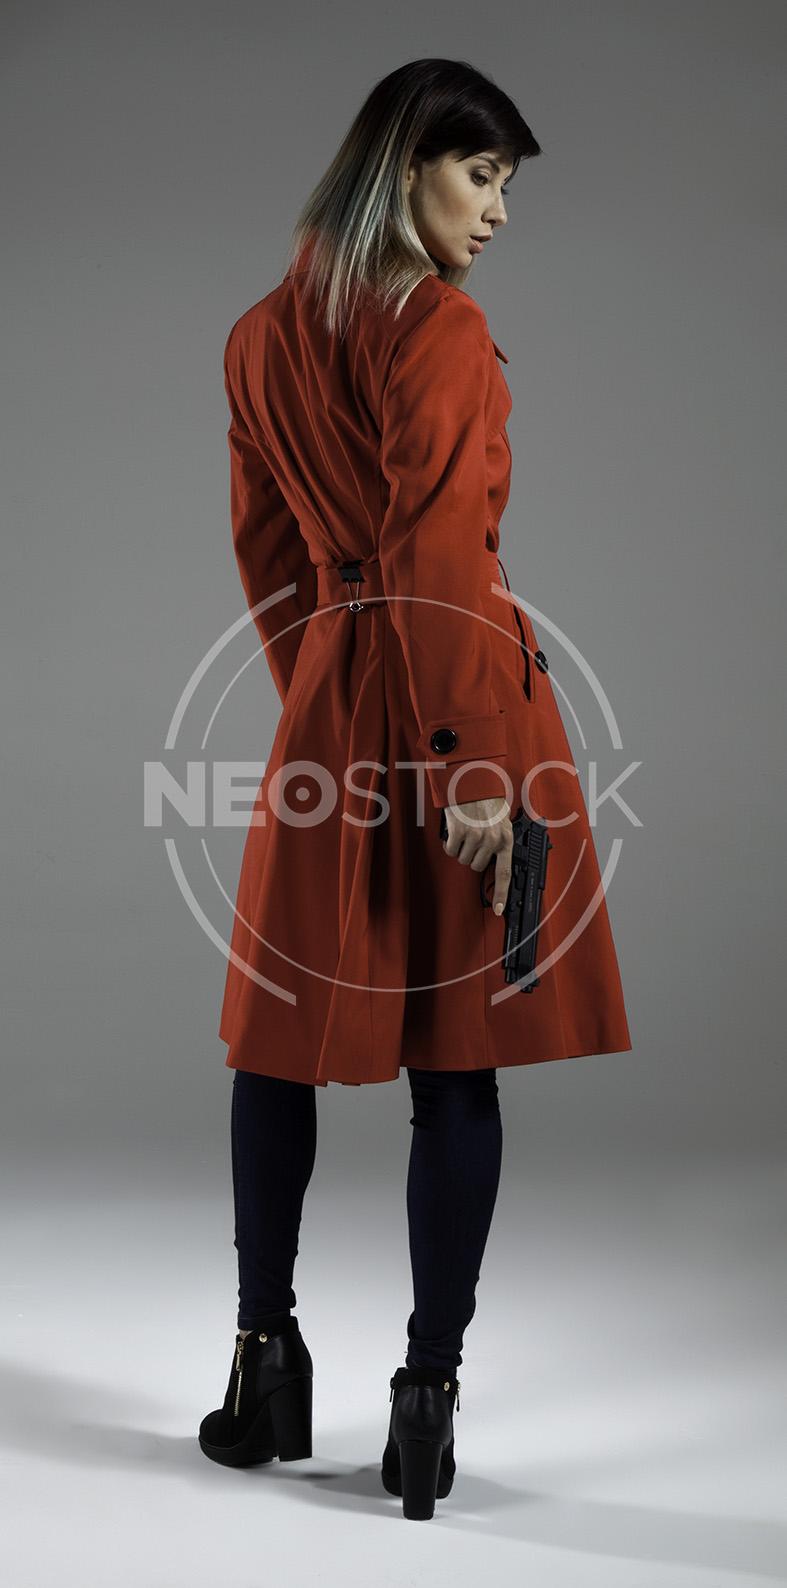 NeoStock - Natalia Mystery Thriller II - Stock Photography